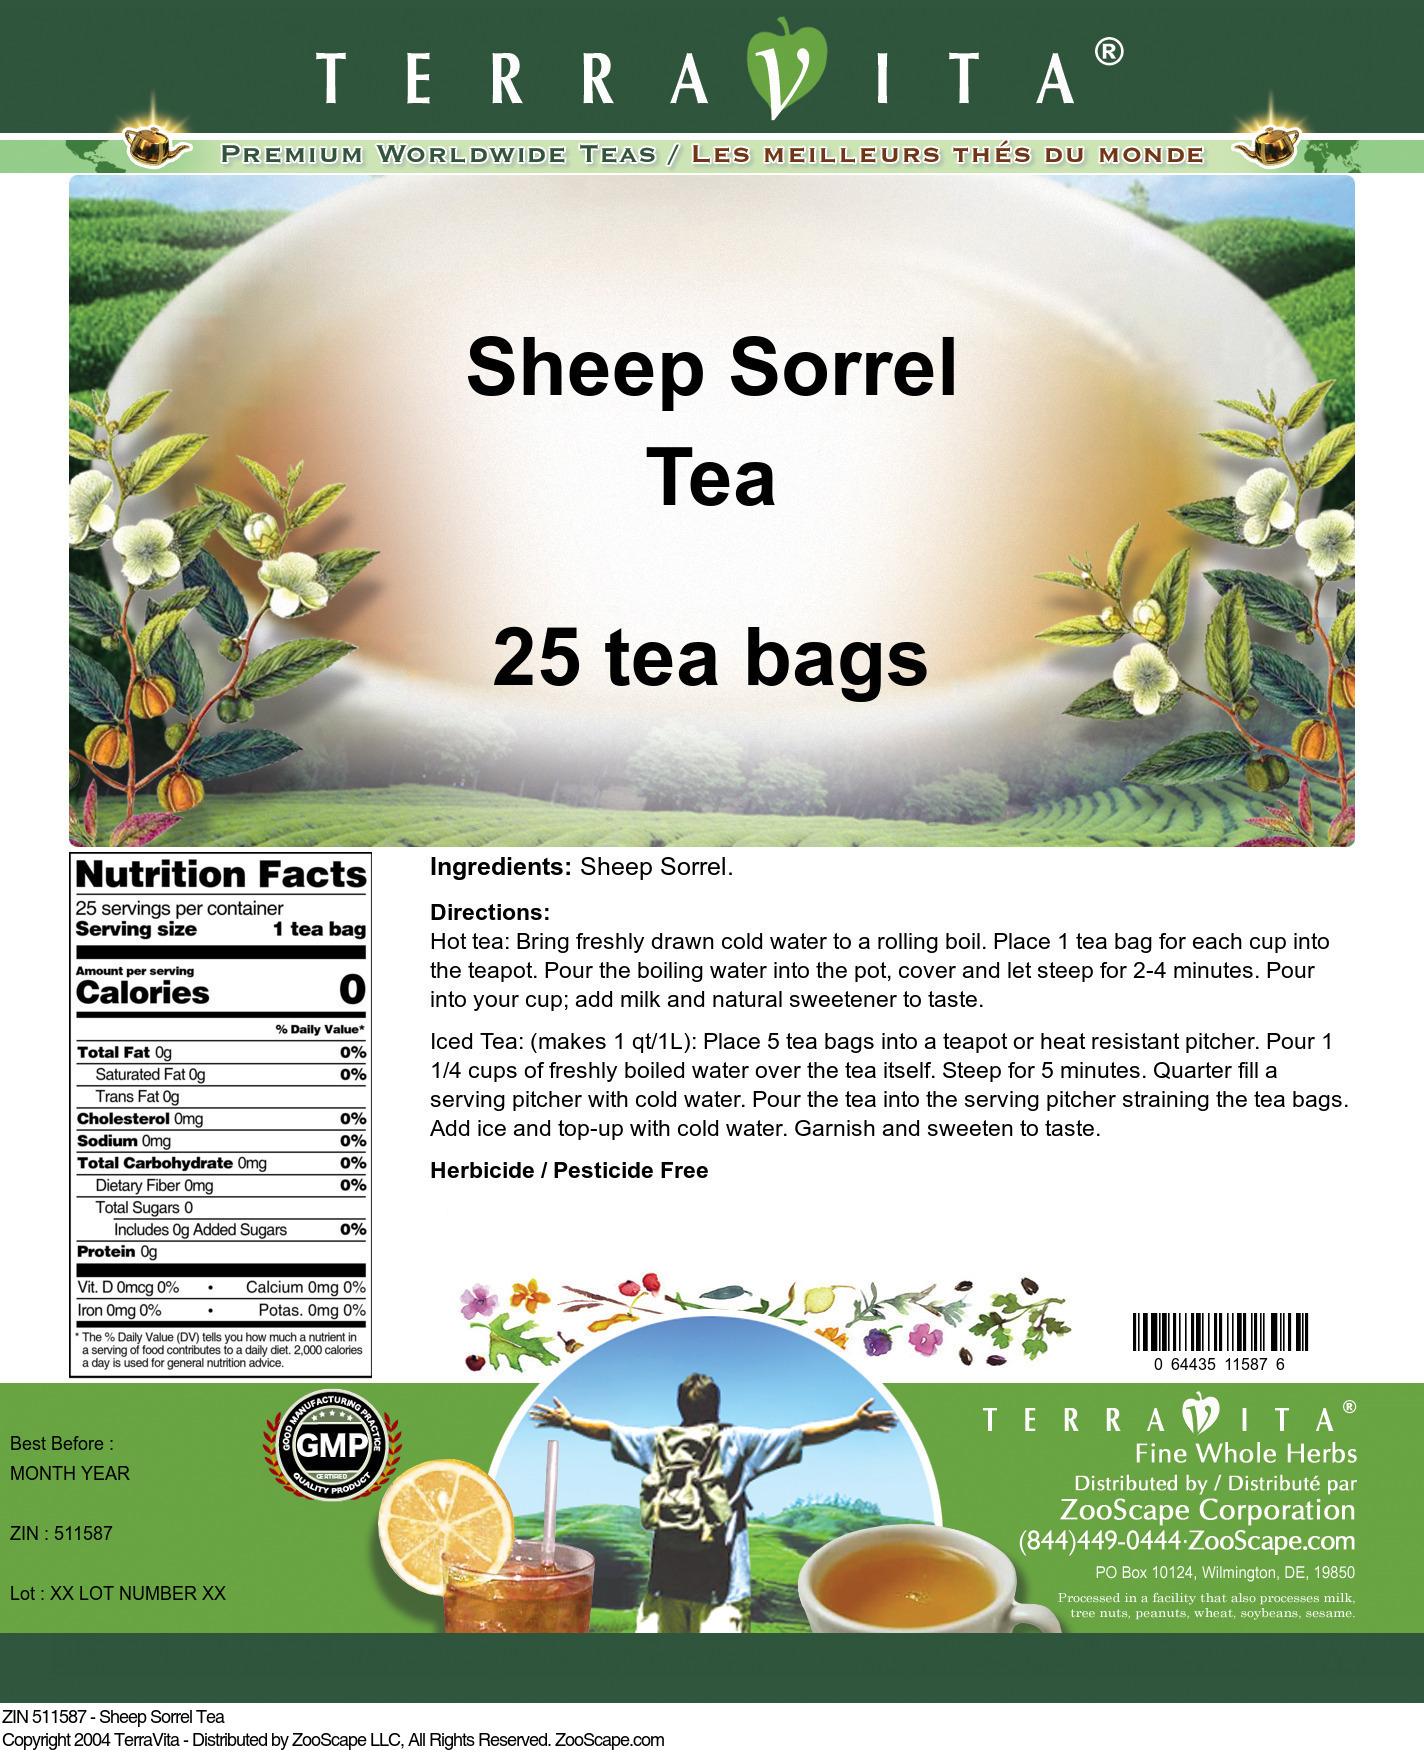 Sheep Sorrel Tea